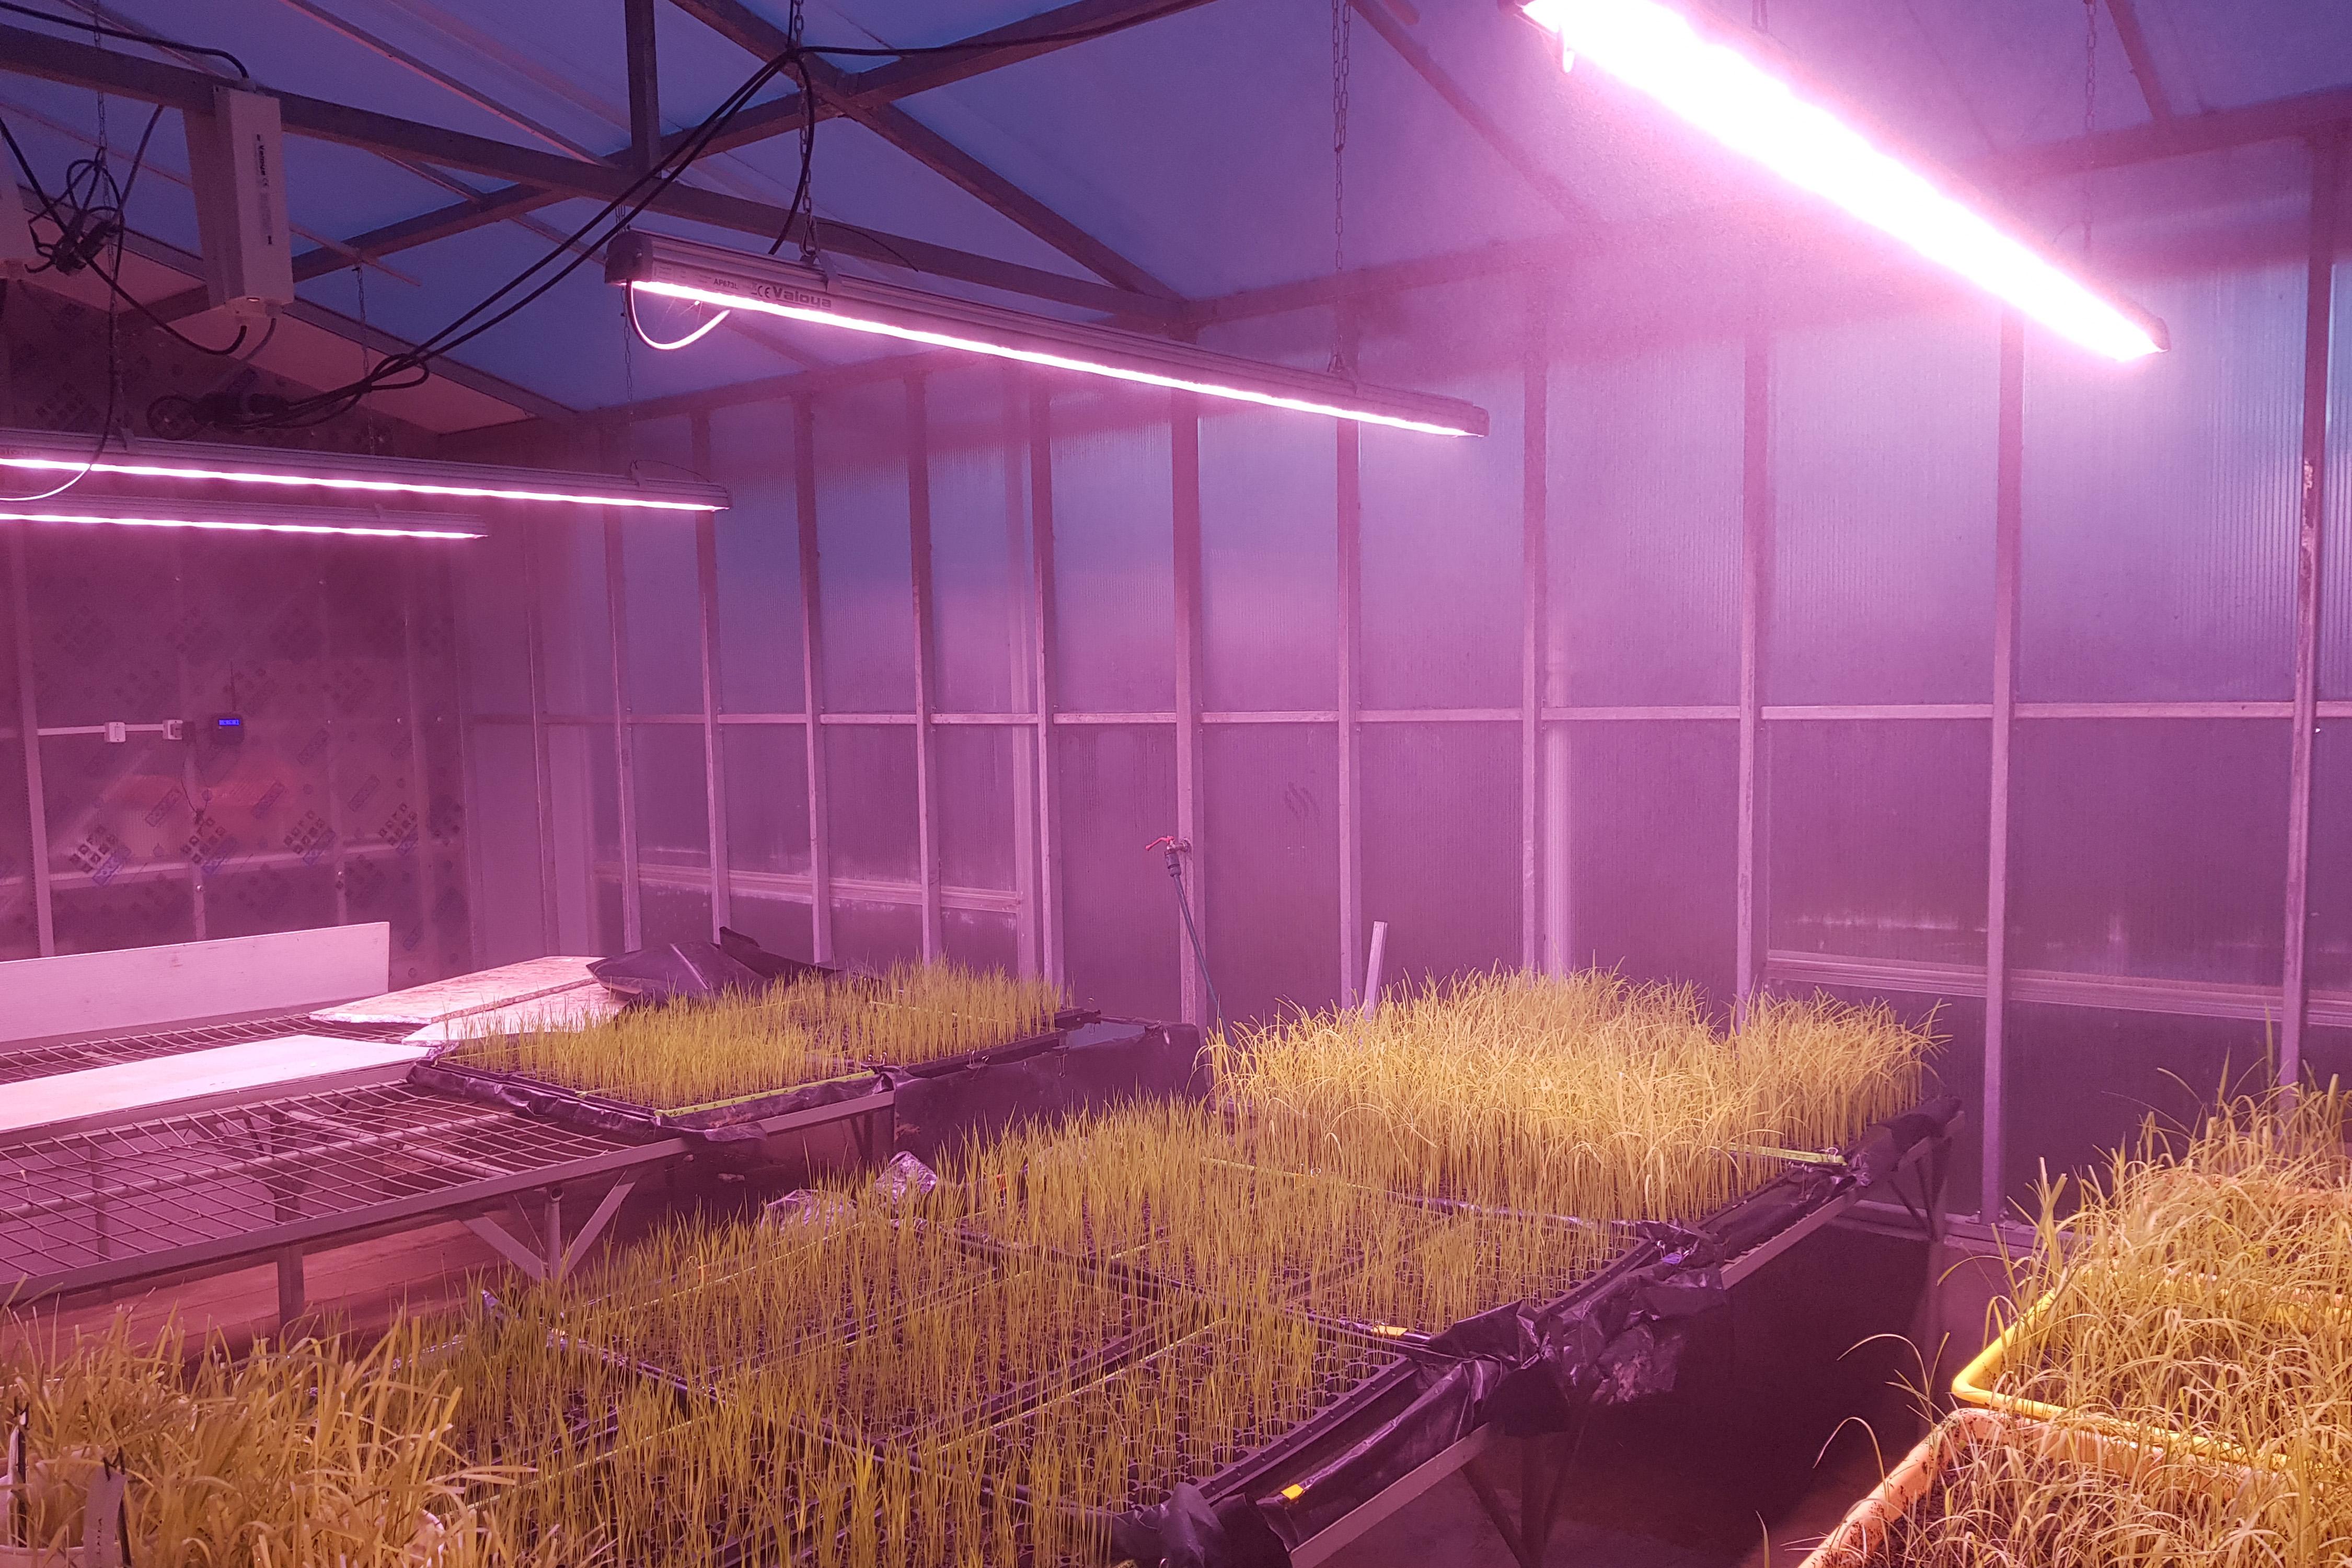 https://www.advanticsys.com/wp-content/uploads/2018/11/greenhouse-inia-lighting.jpg